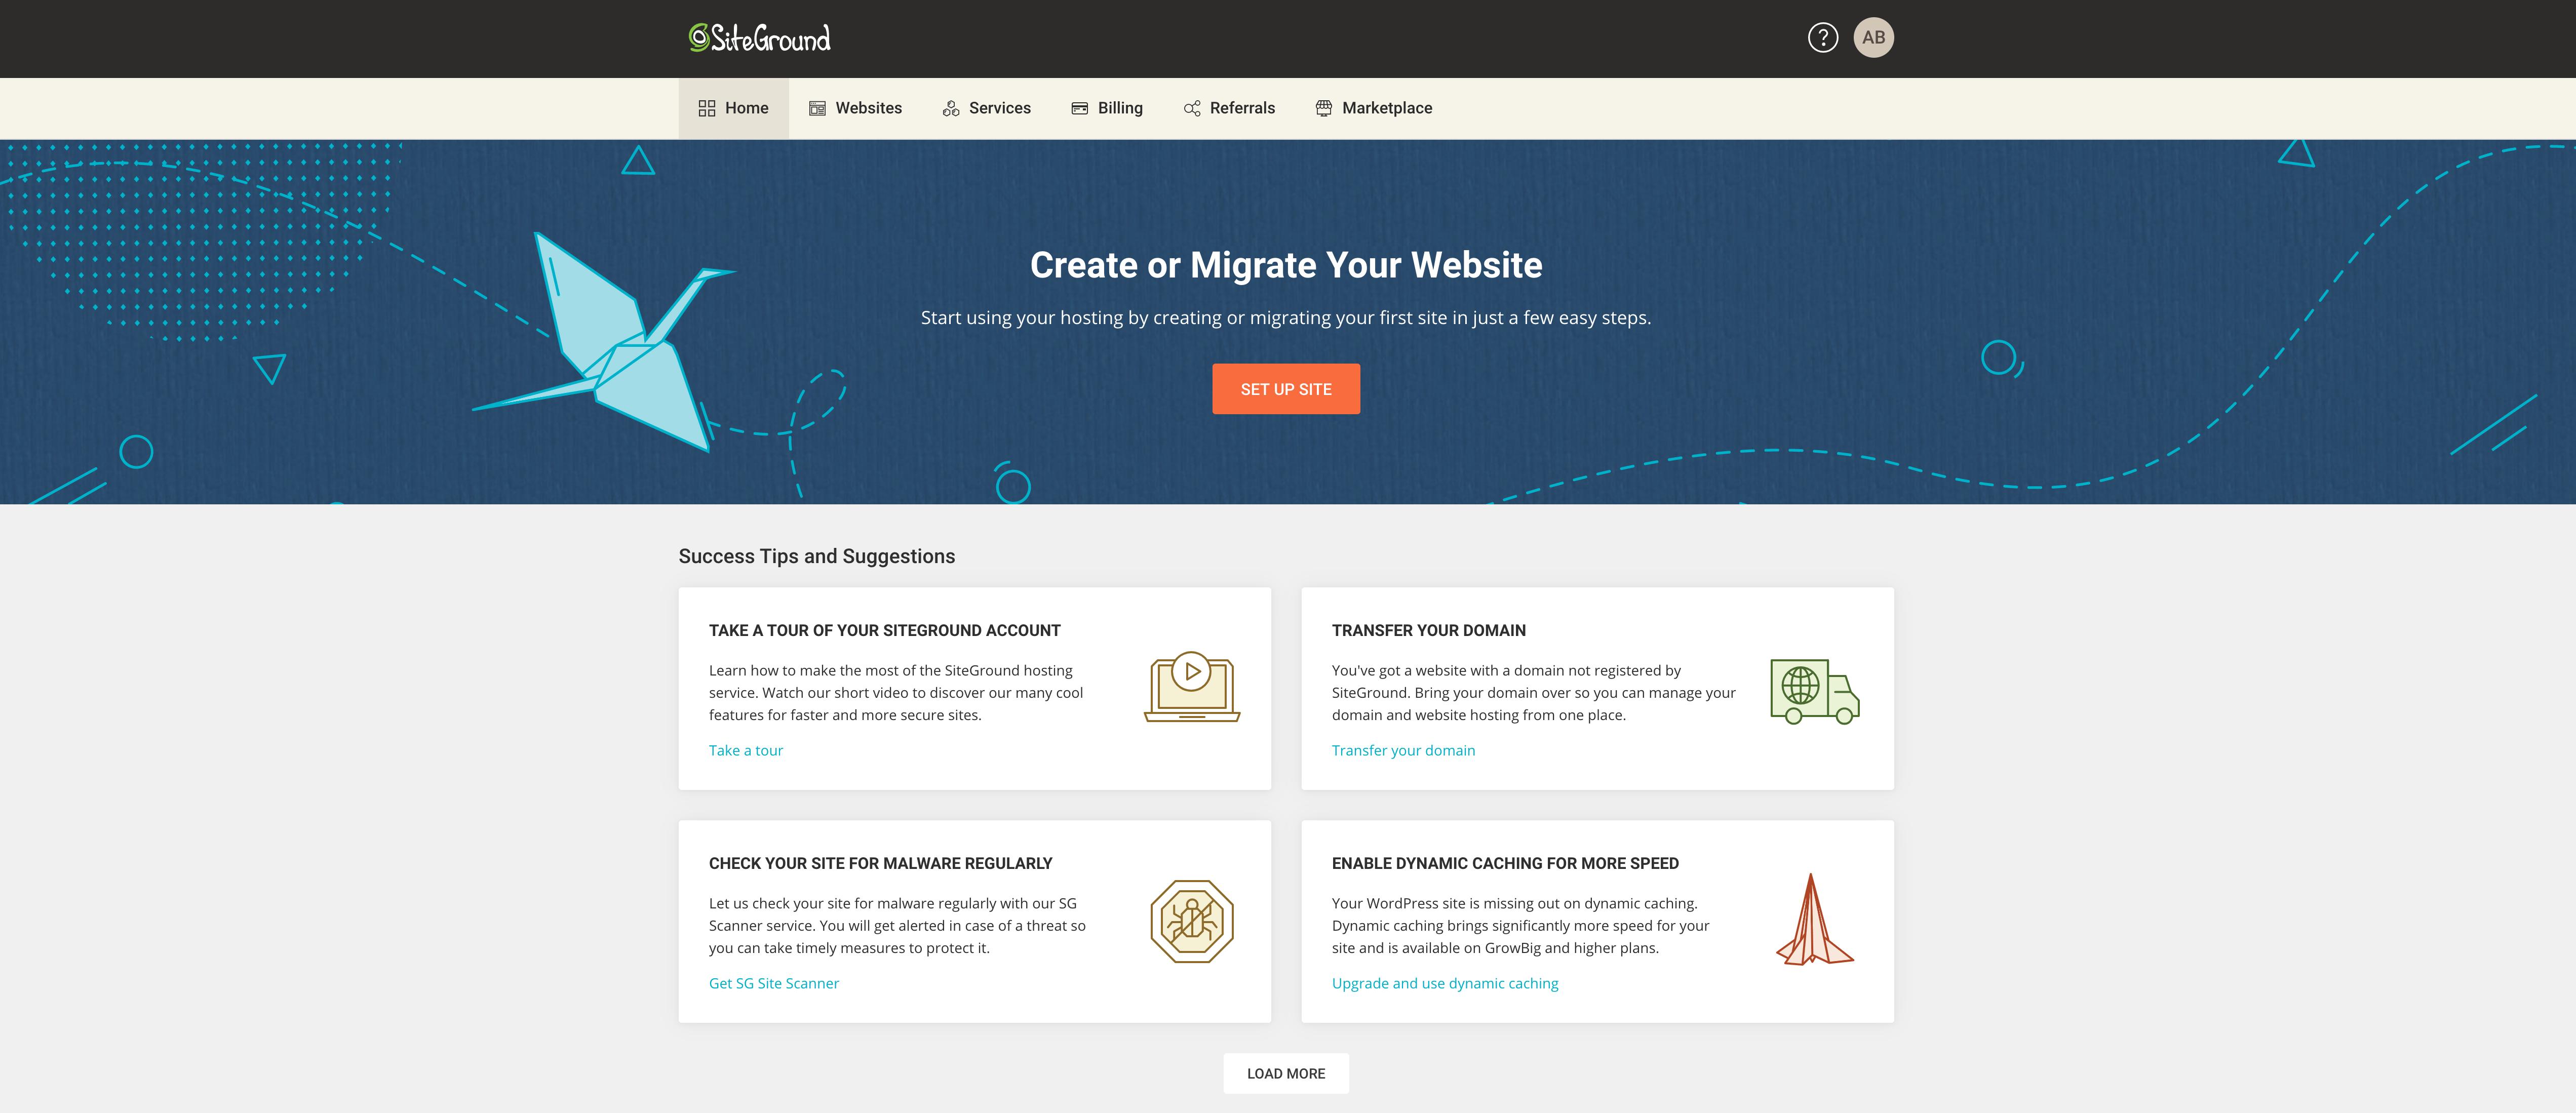 siteground-hosting-step-1